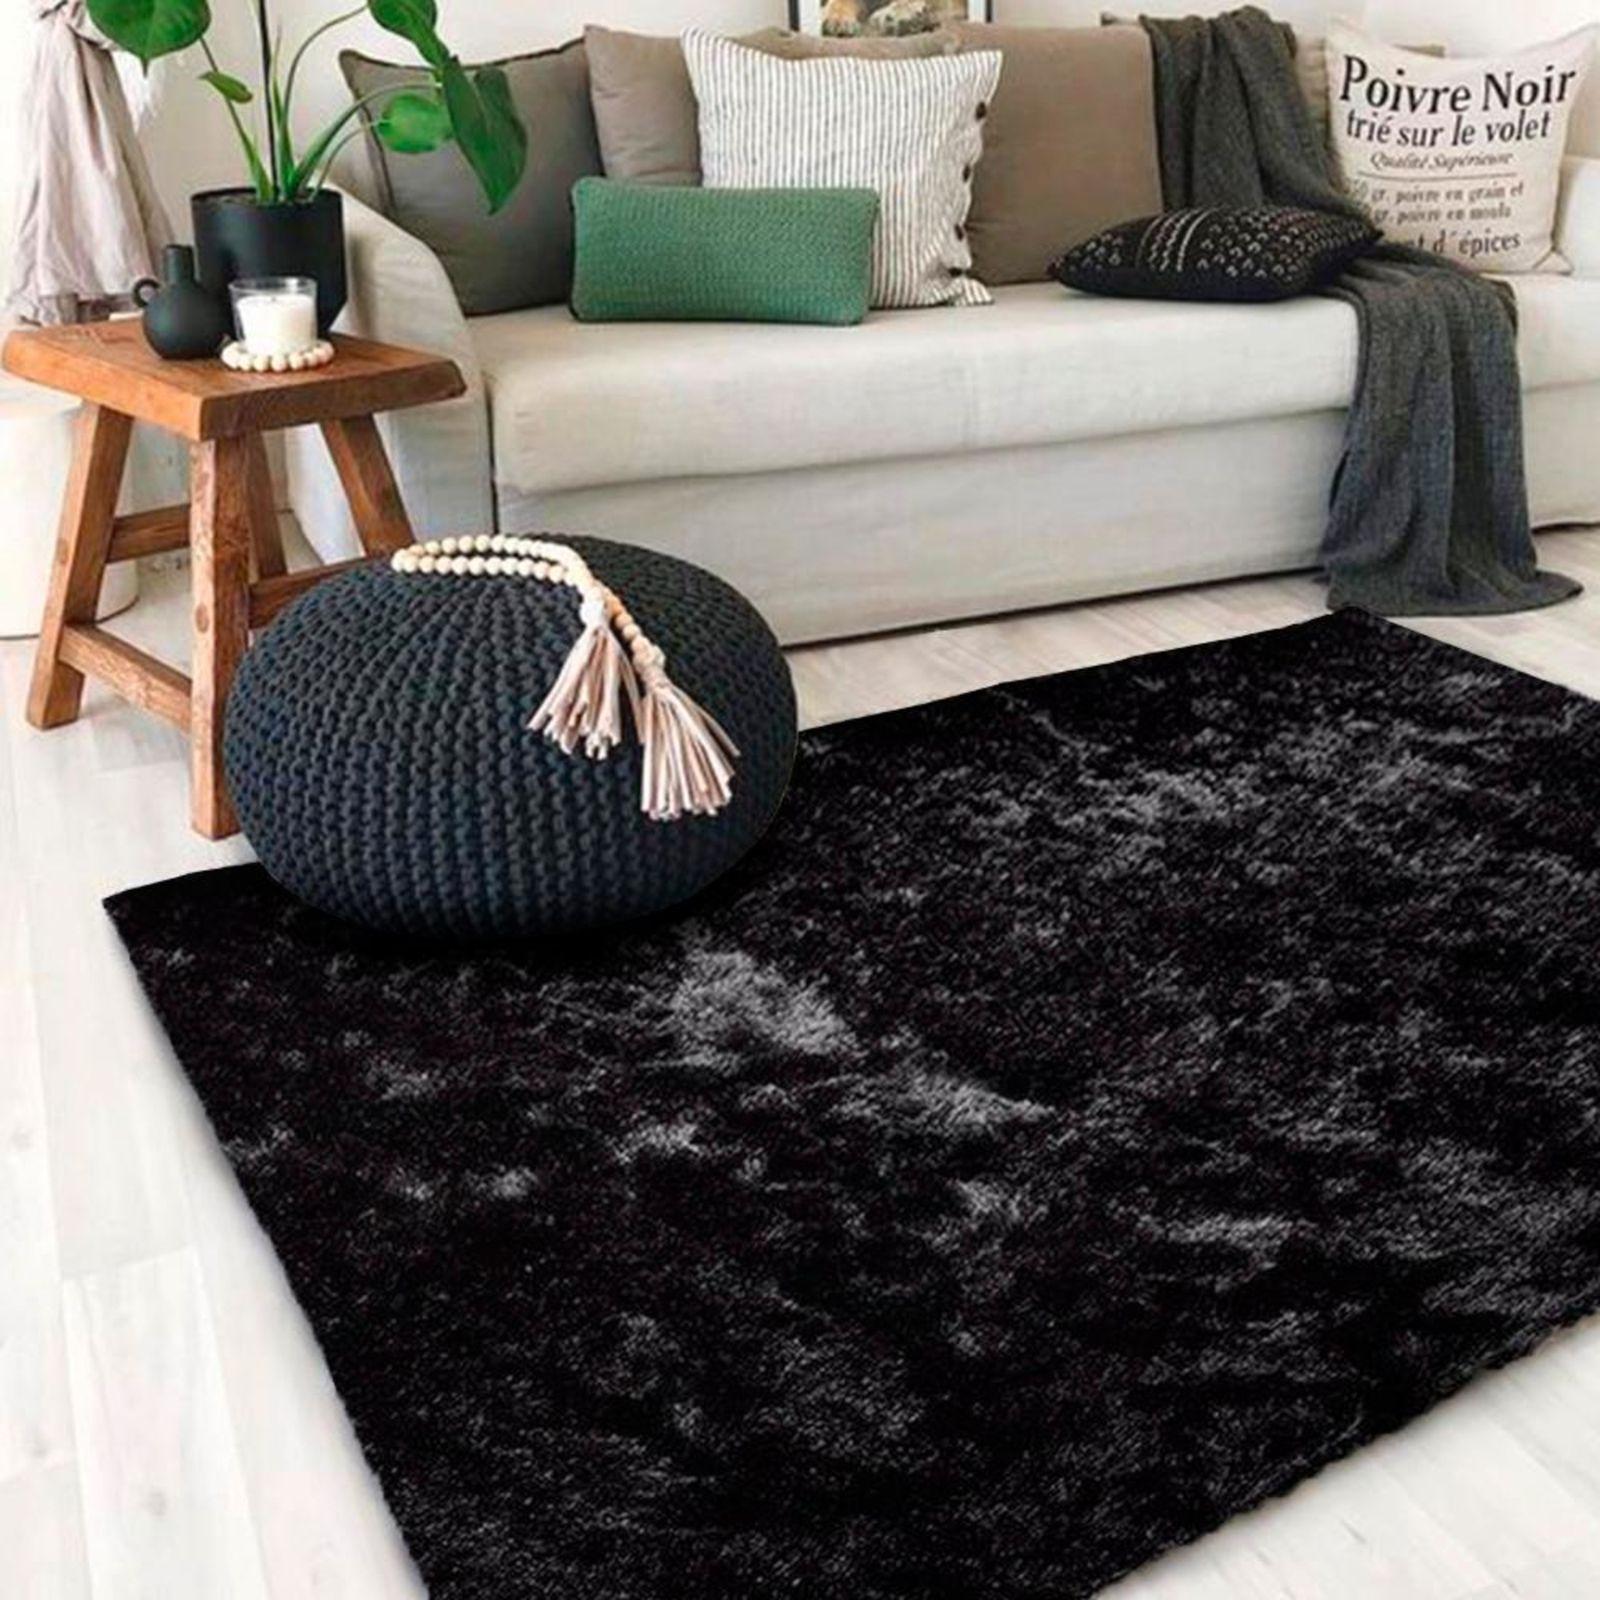 Tapete preto na sala de estar